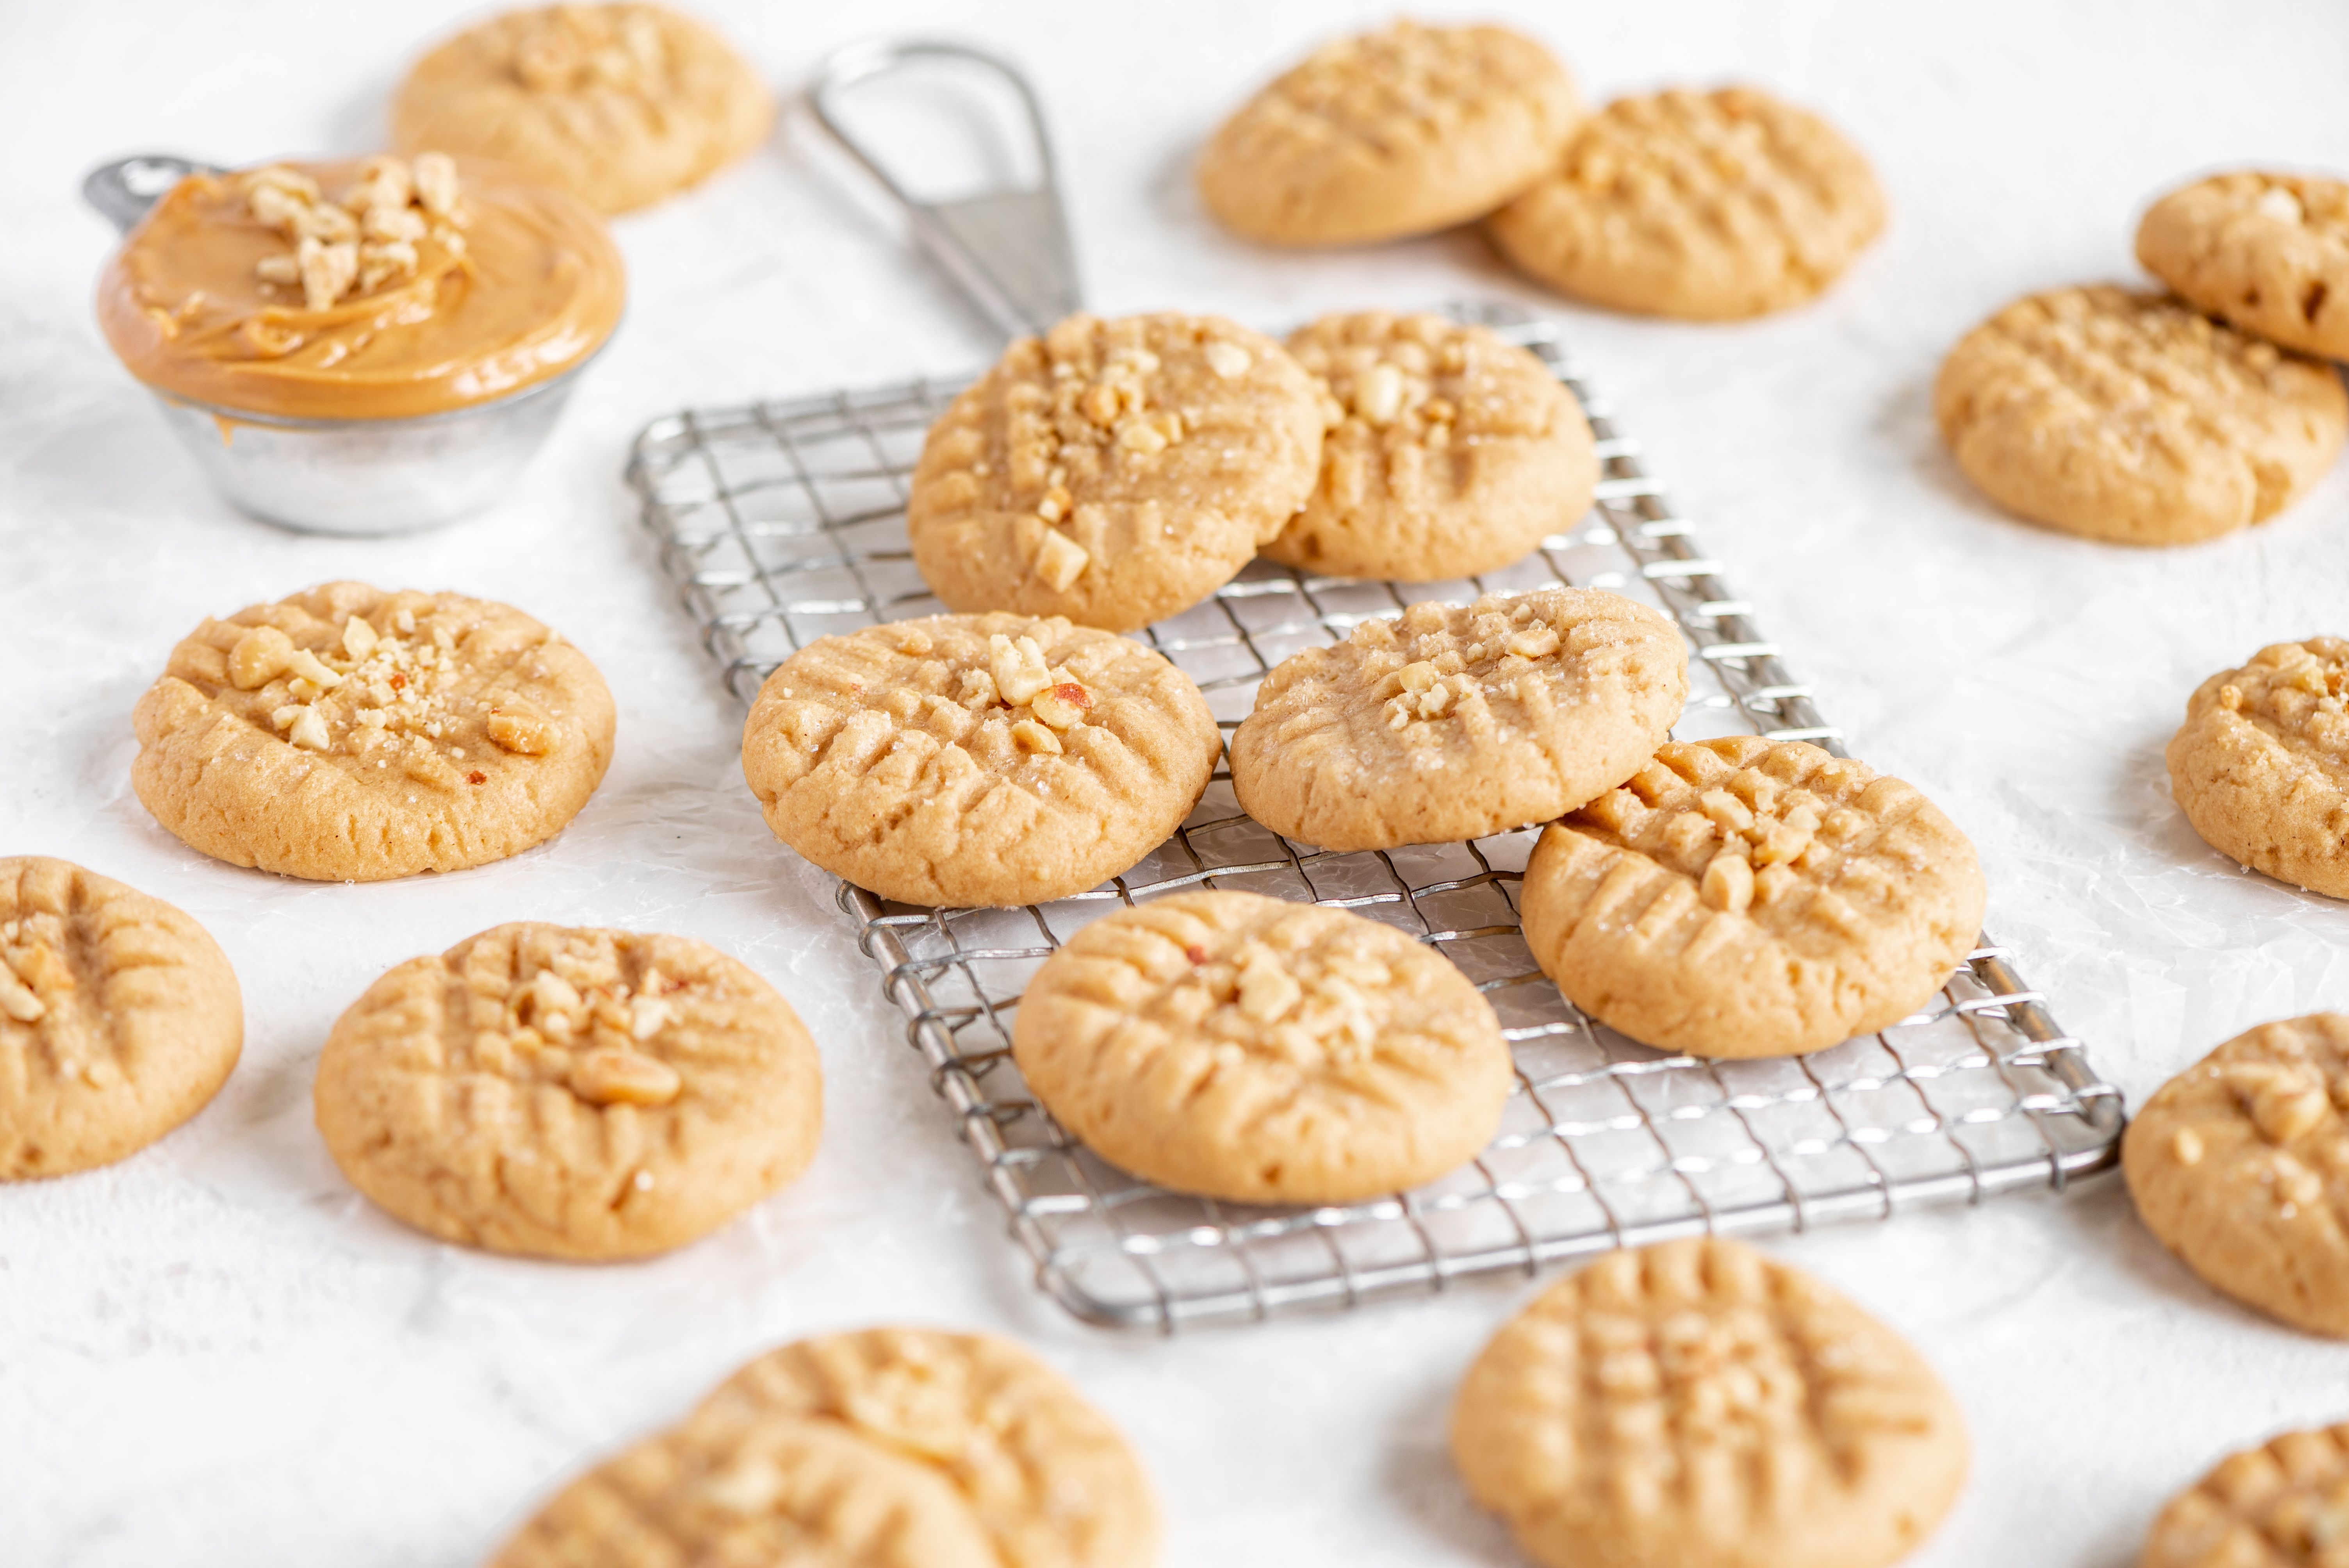 Peanut Butter Cookies Recipe In 2020 Sour Cream Cookies Peanut Butter Cookie Recipe Peanut Butter Cookies